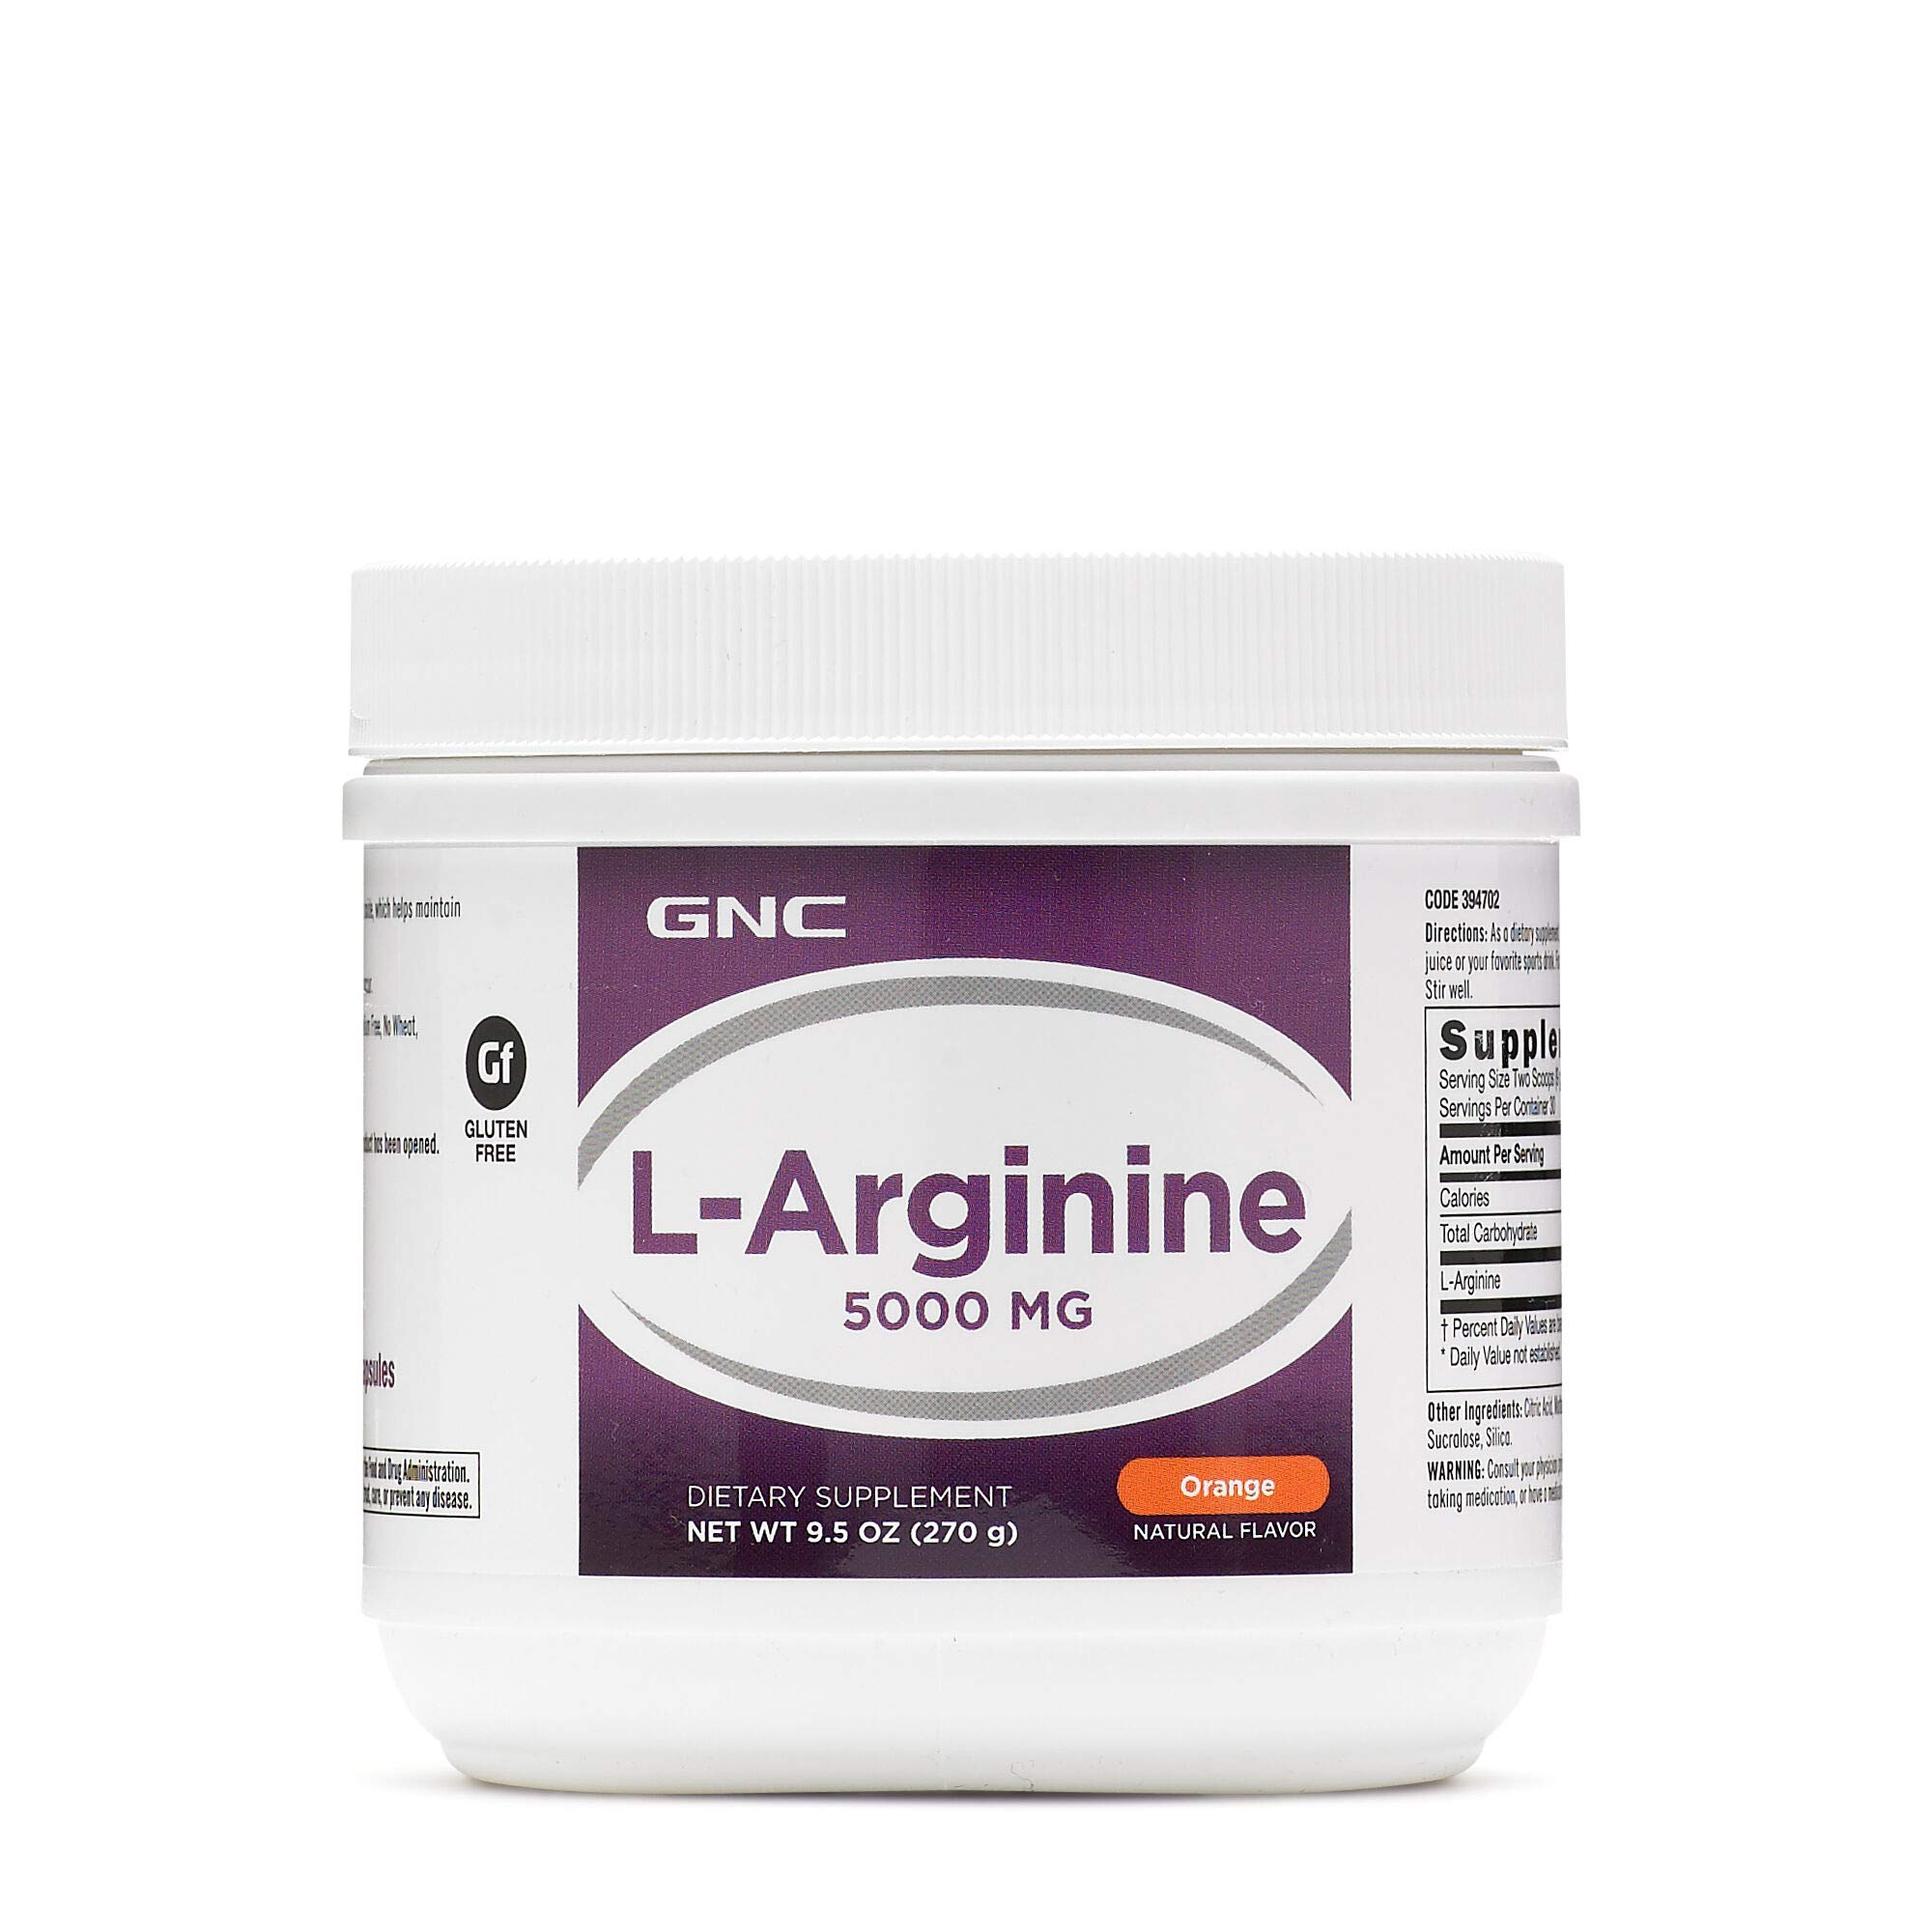 GNC LArginine 5000mg Orange 270 g by GNC